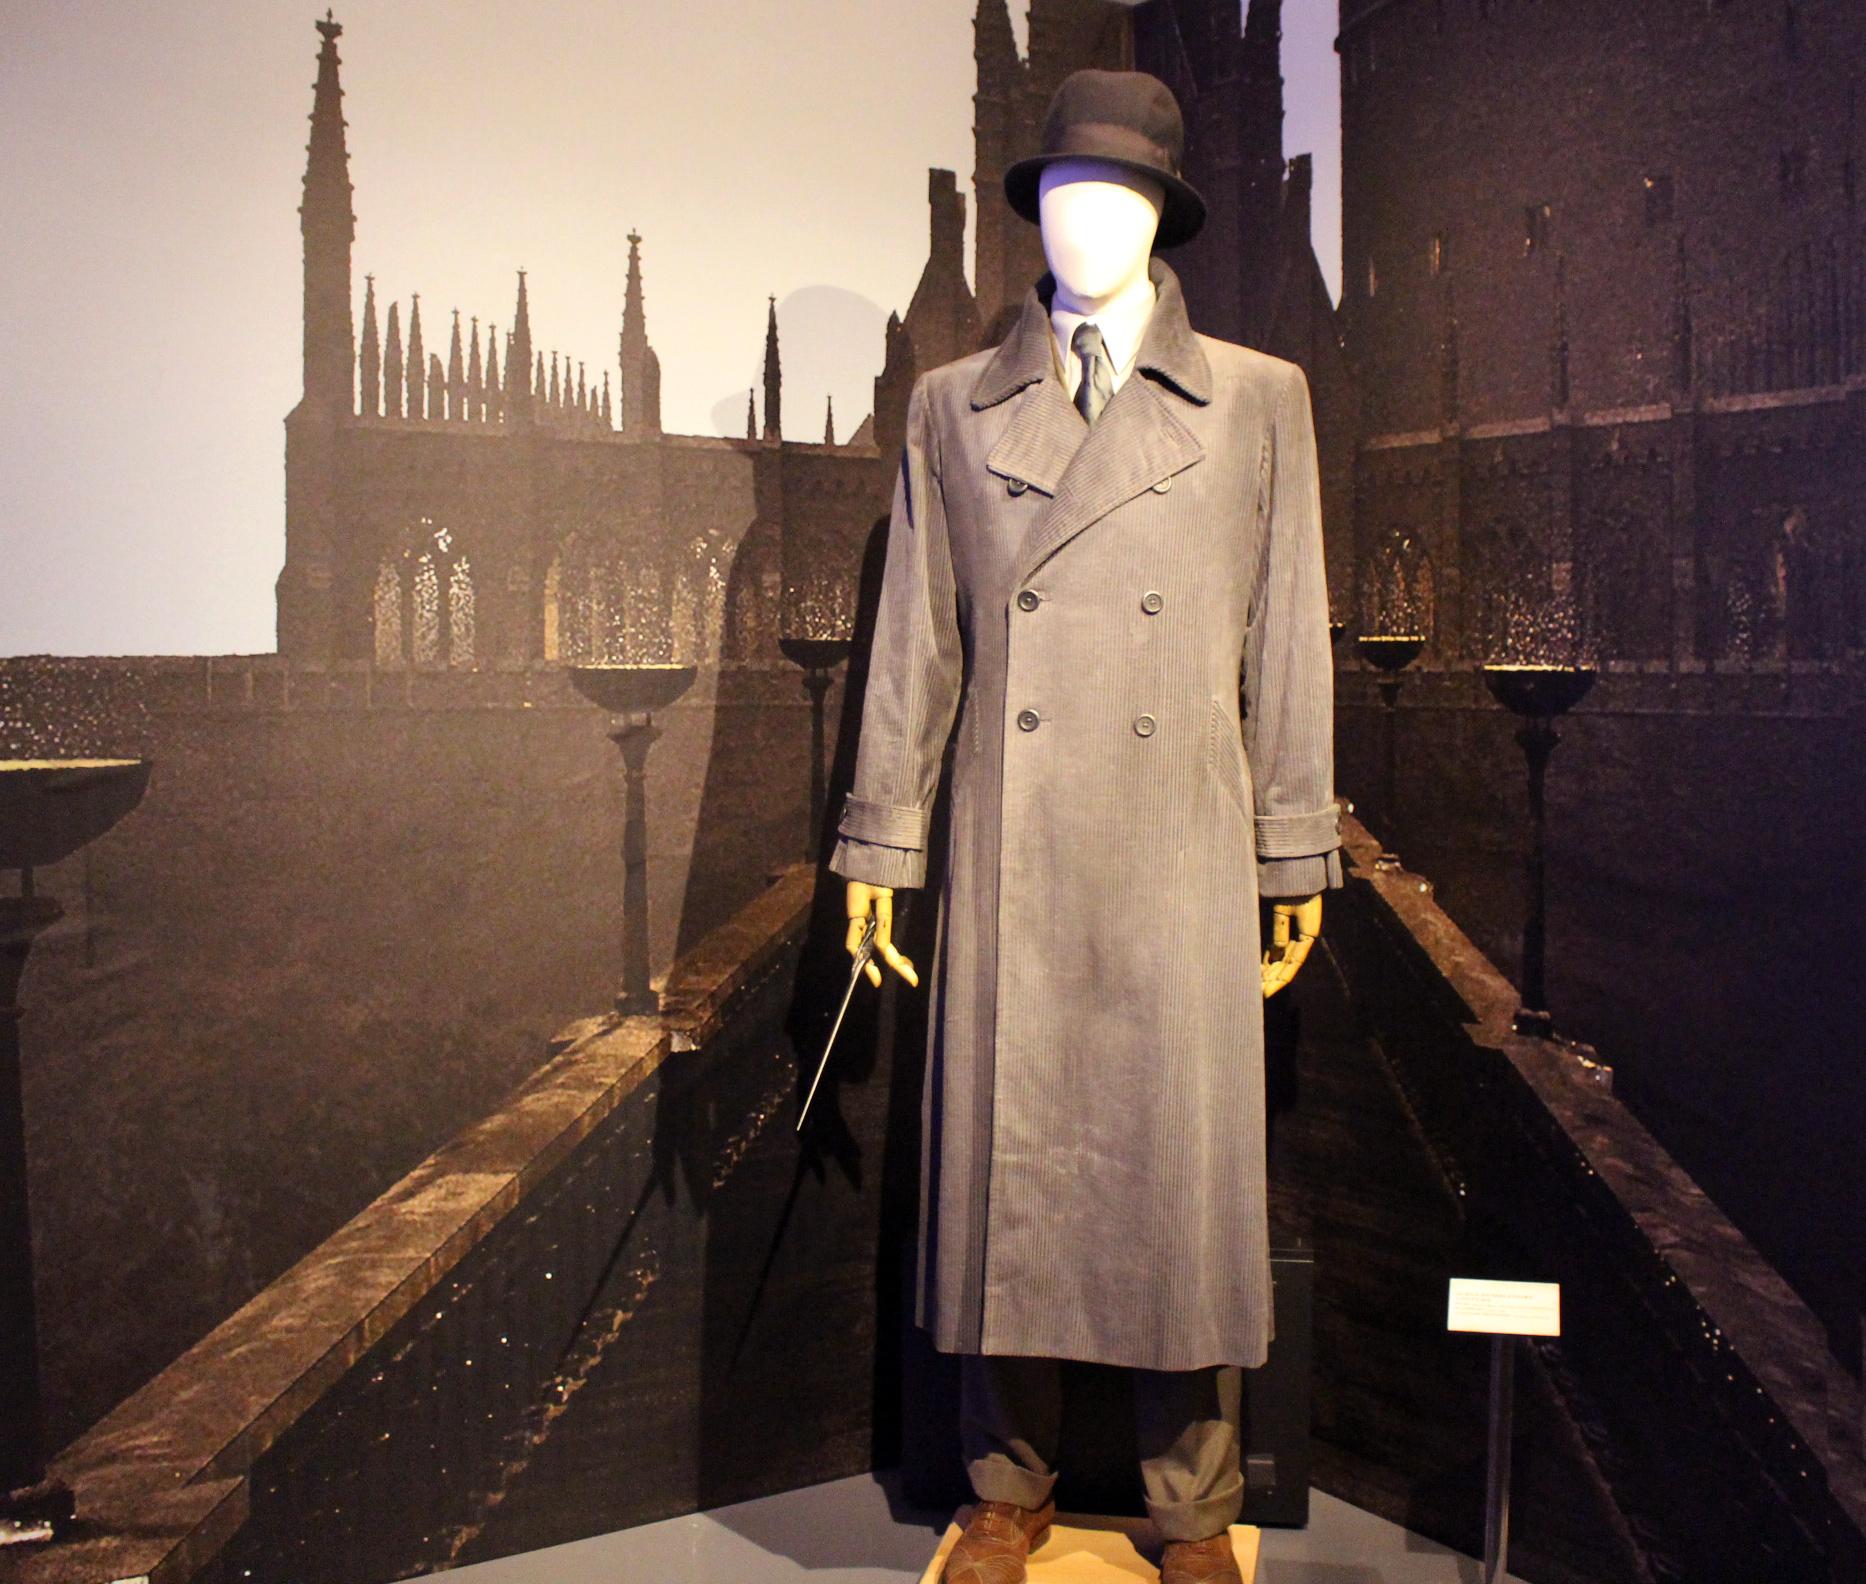 Les costumes des Crimes de Grindelwald exposés à Hollywood